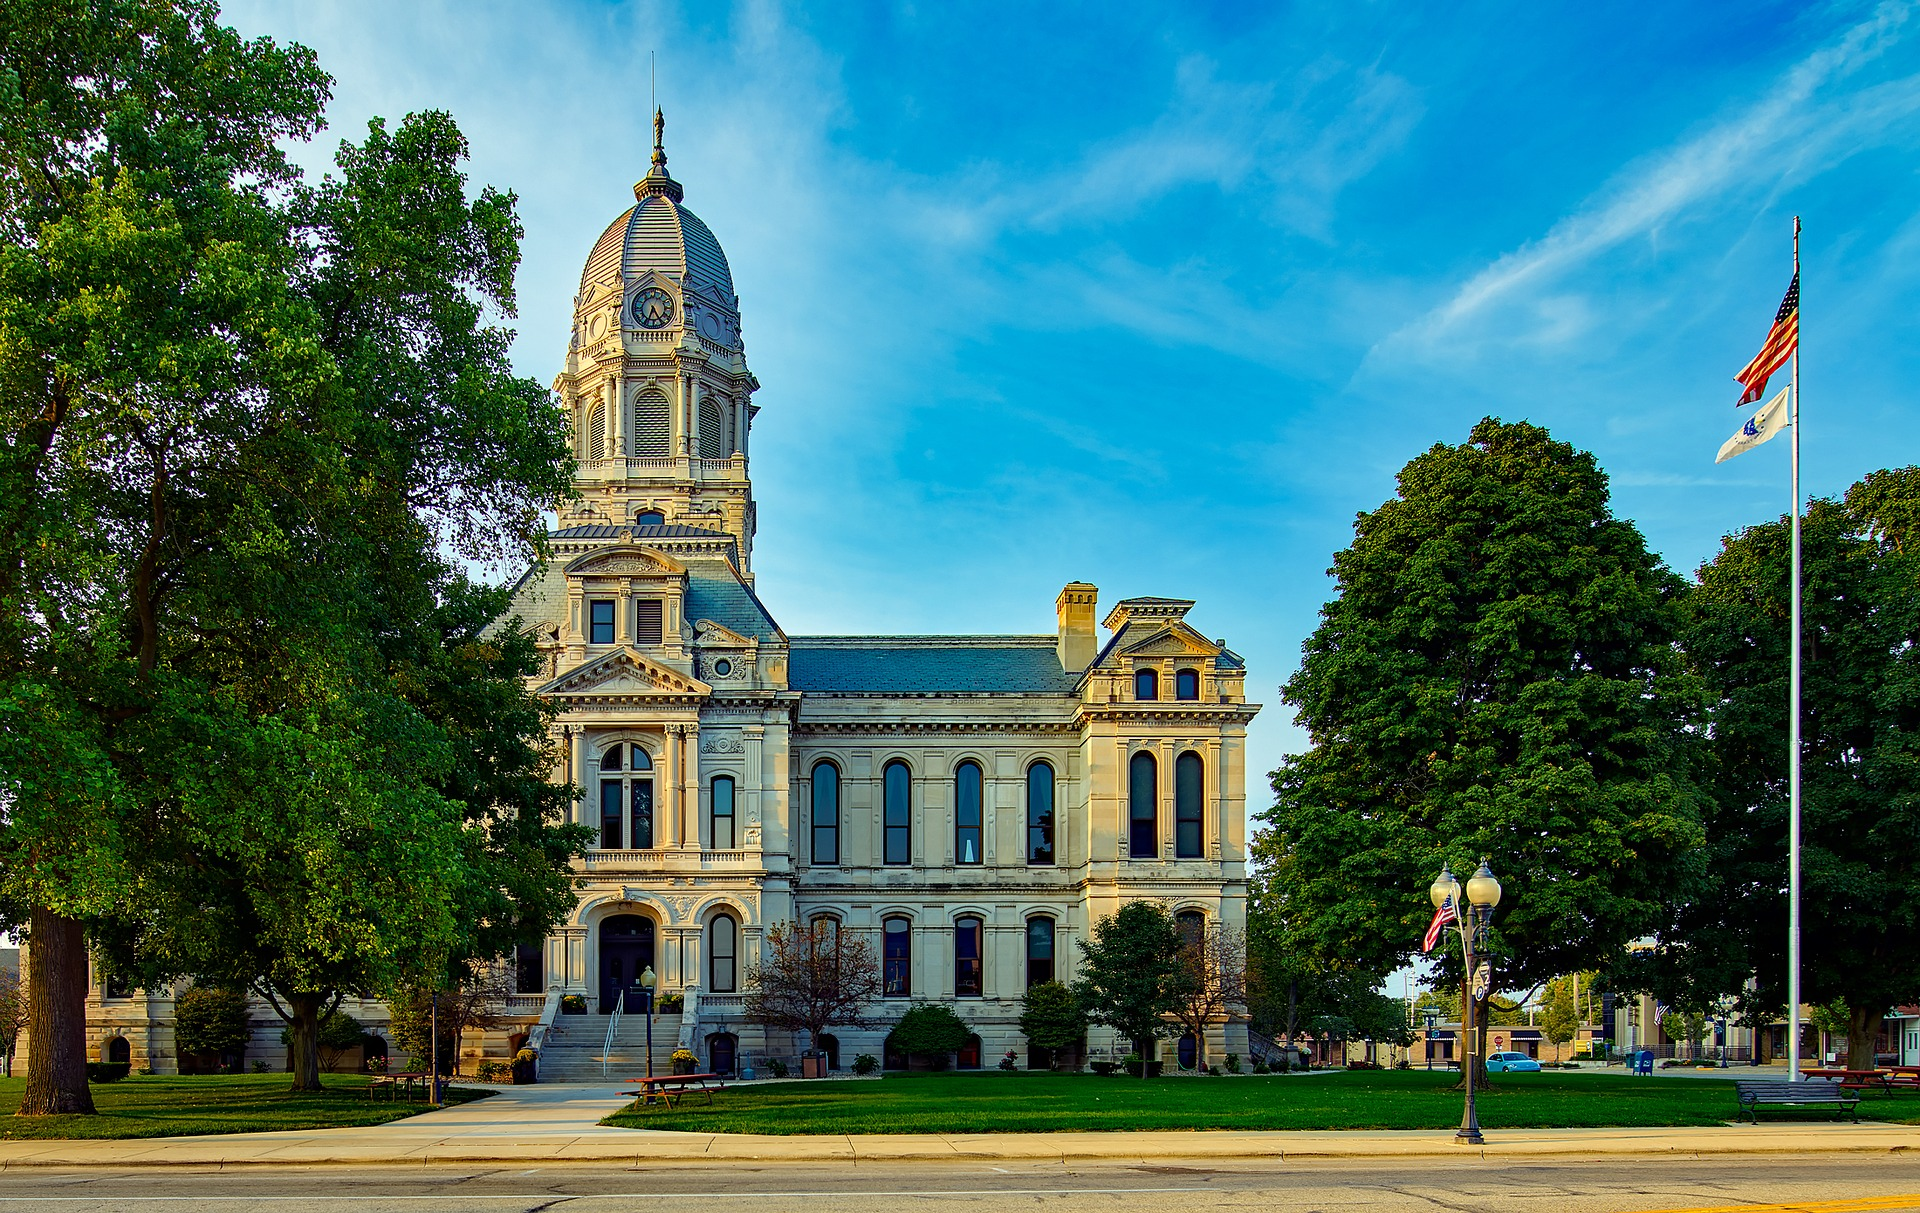 courthouse-1933325_1920.jpg